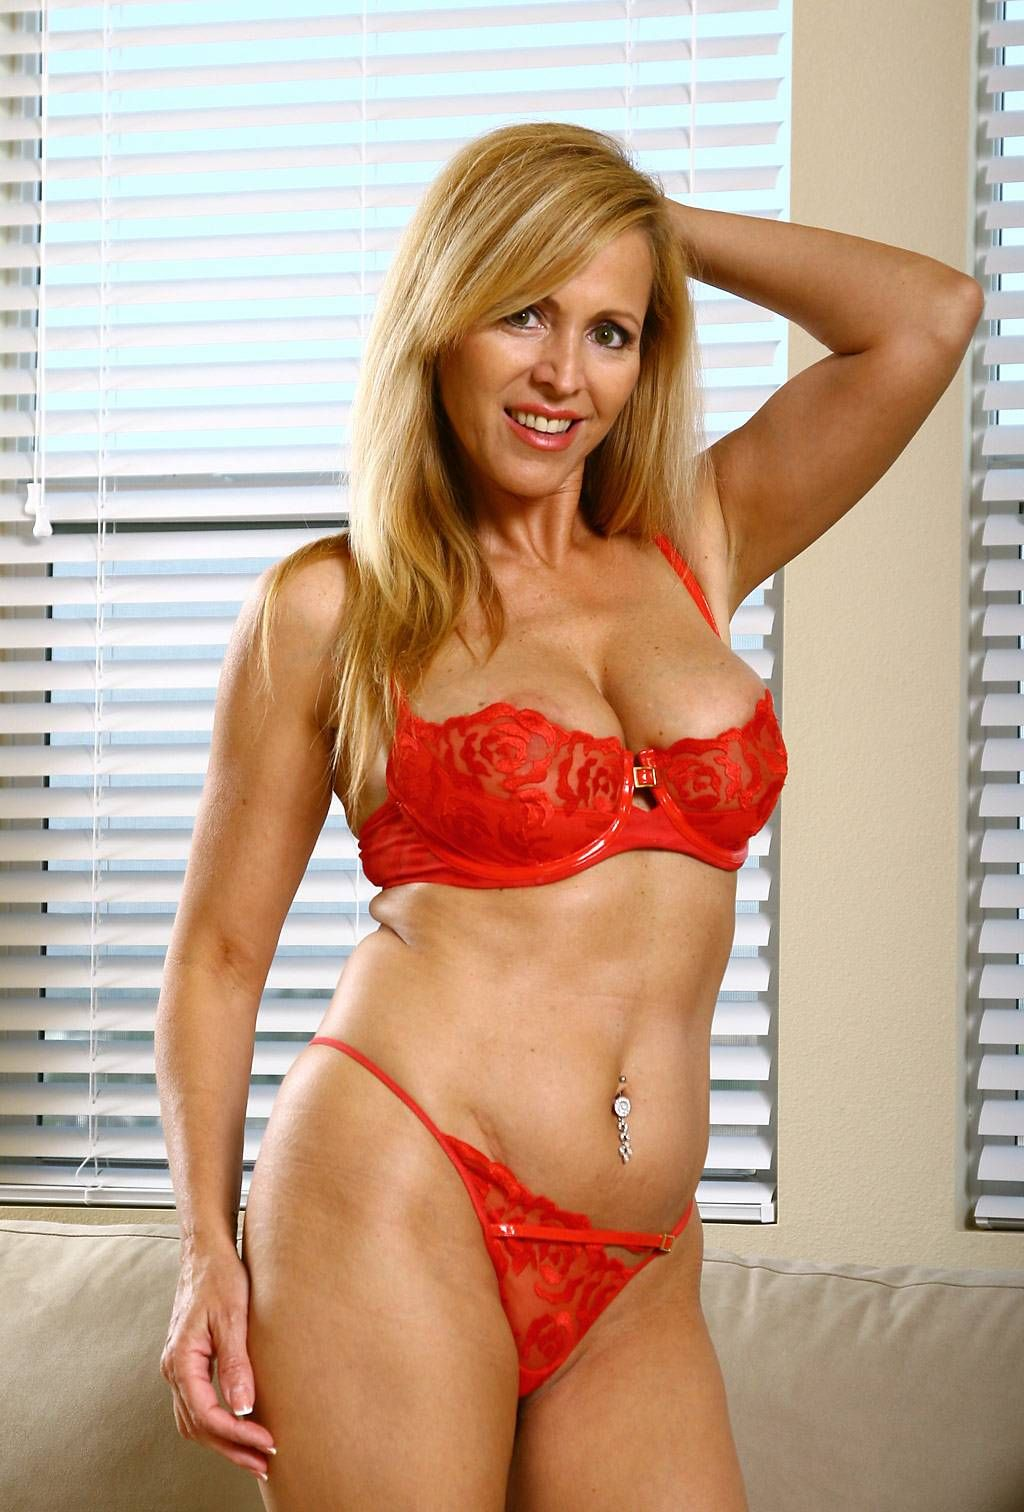 Nicole Moore Nude Photos 2019 - 2020 - Hot Leaked Naked -7781